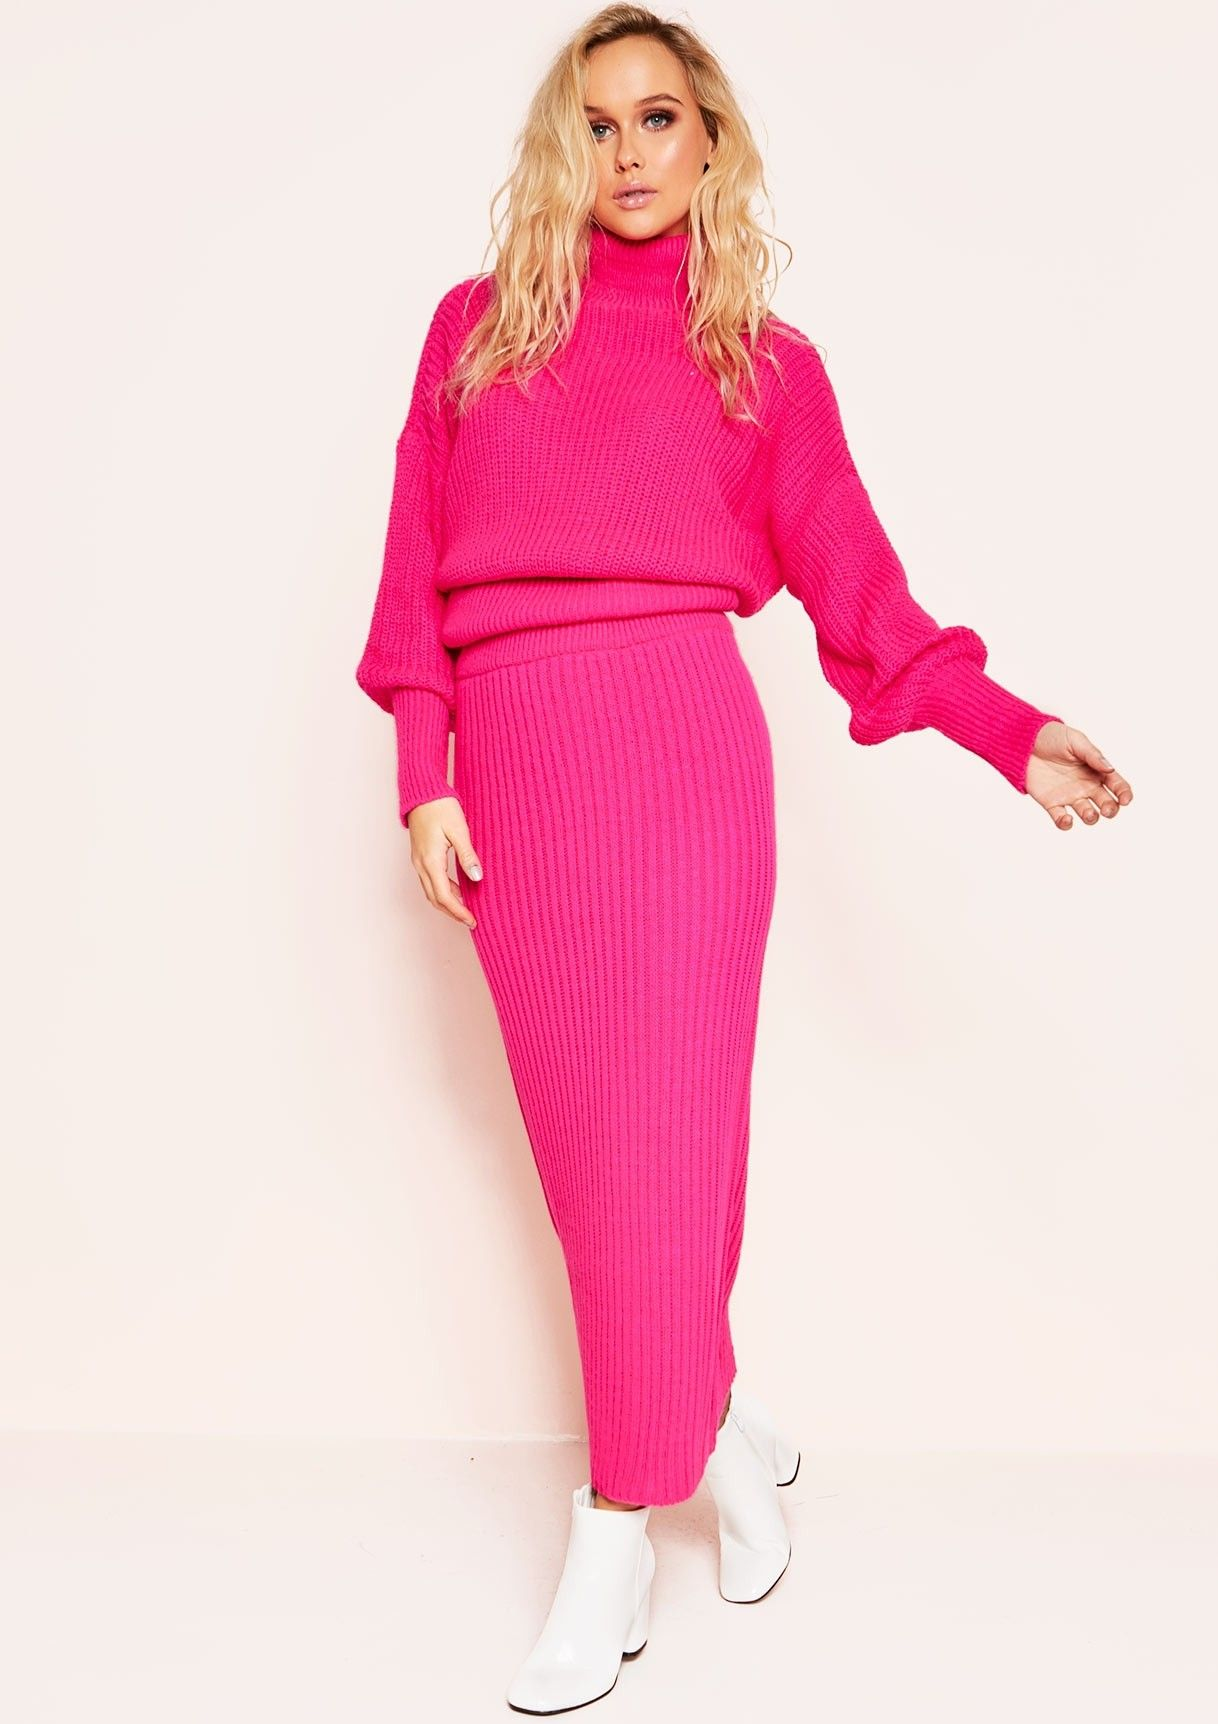 Missyempire - Vicki Neon Pink Knit Jumper Midi Co-ord Set e7ce7a272